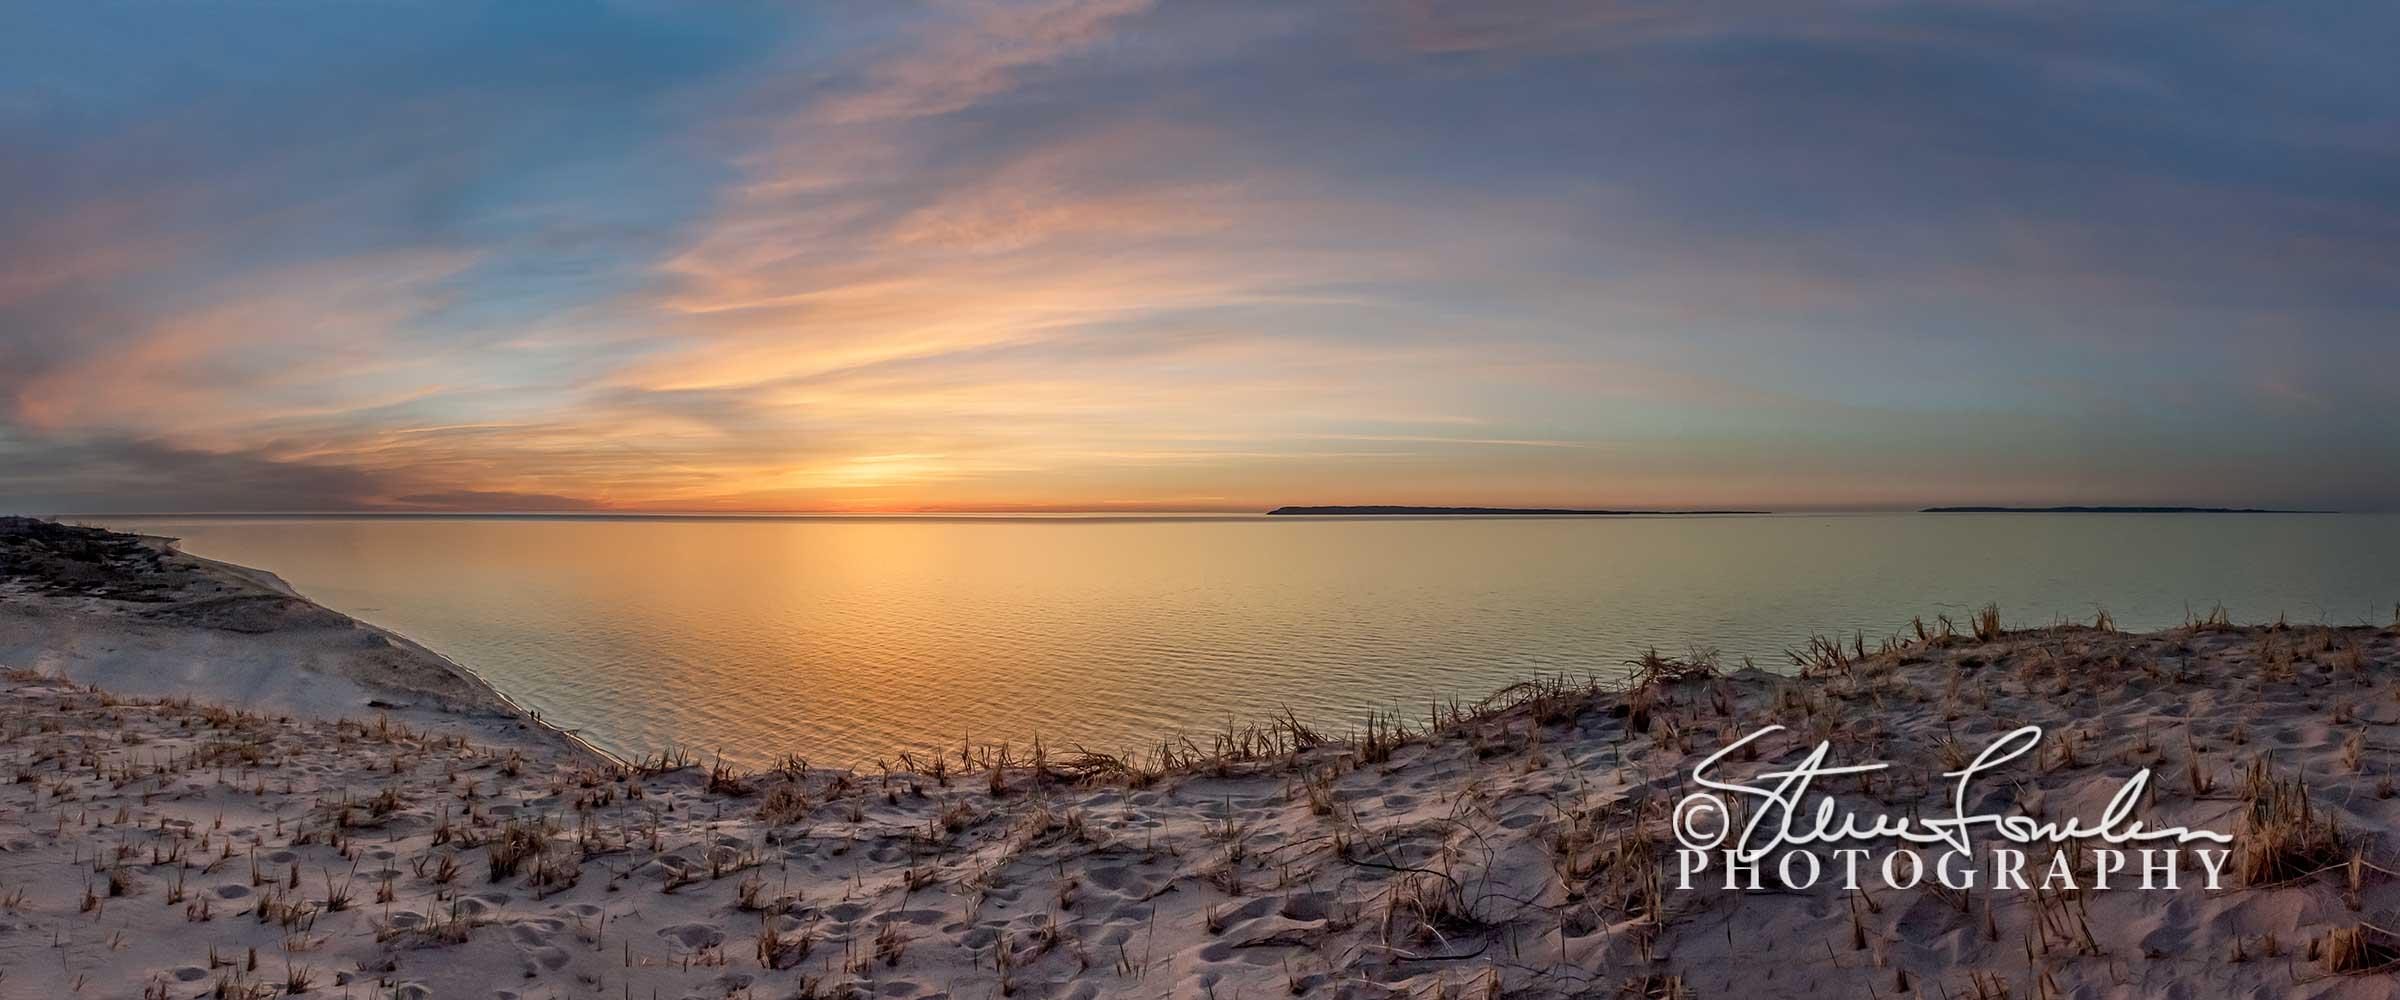 Sleeping-Bear-Dunes-Sunset-pano-May-2013